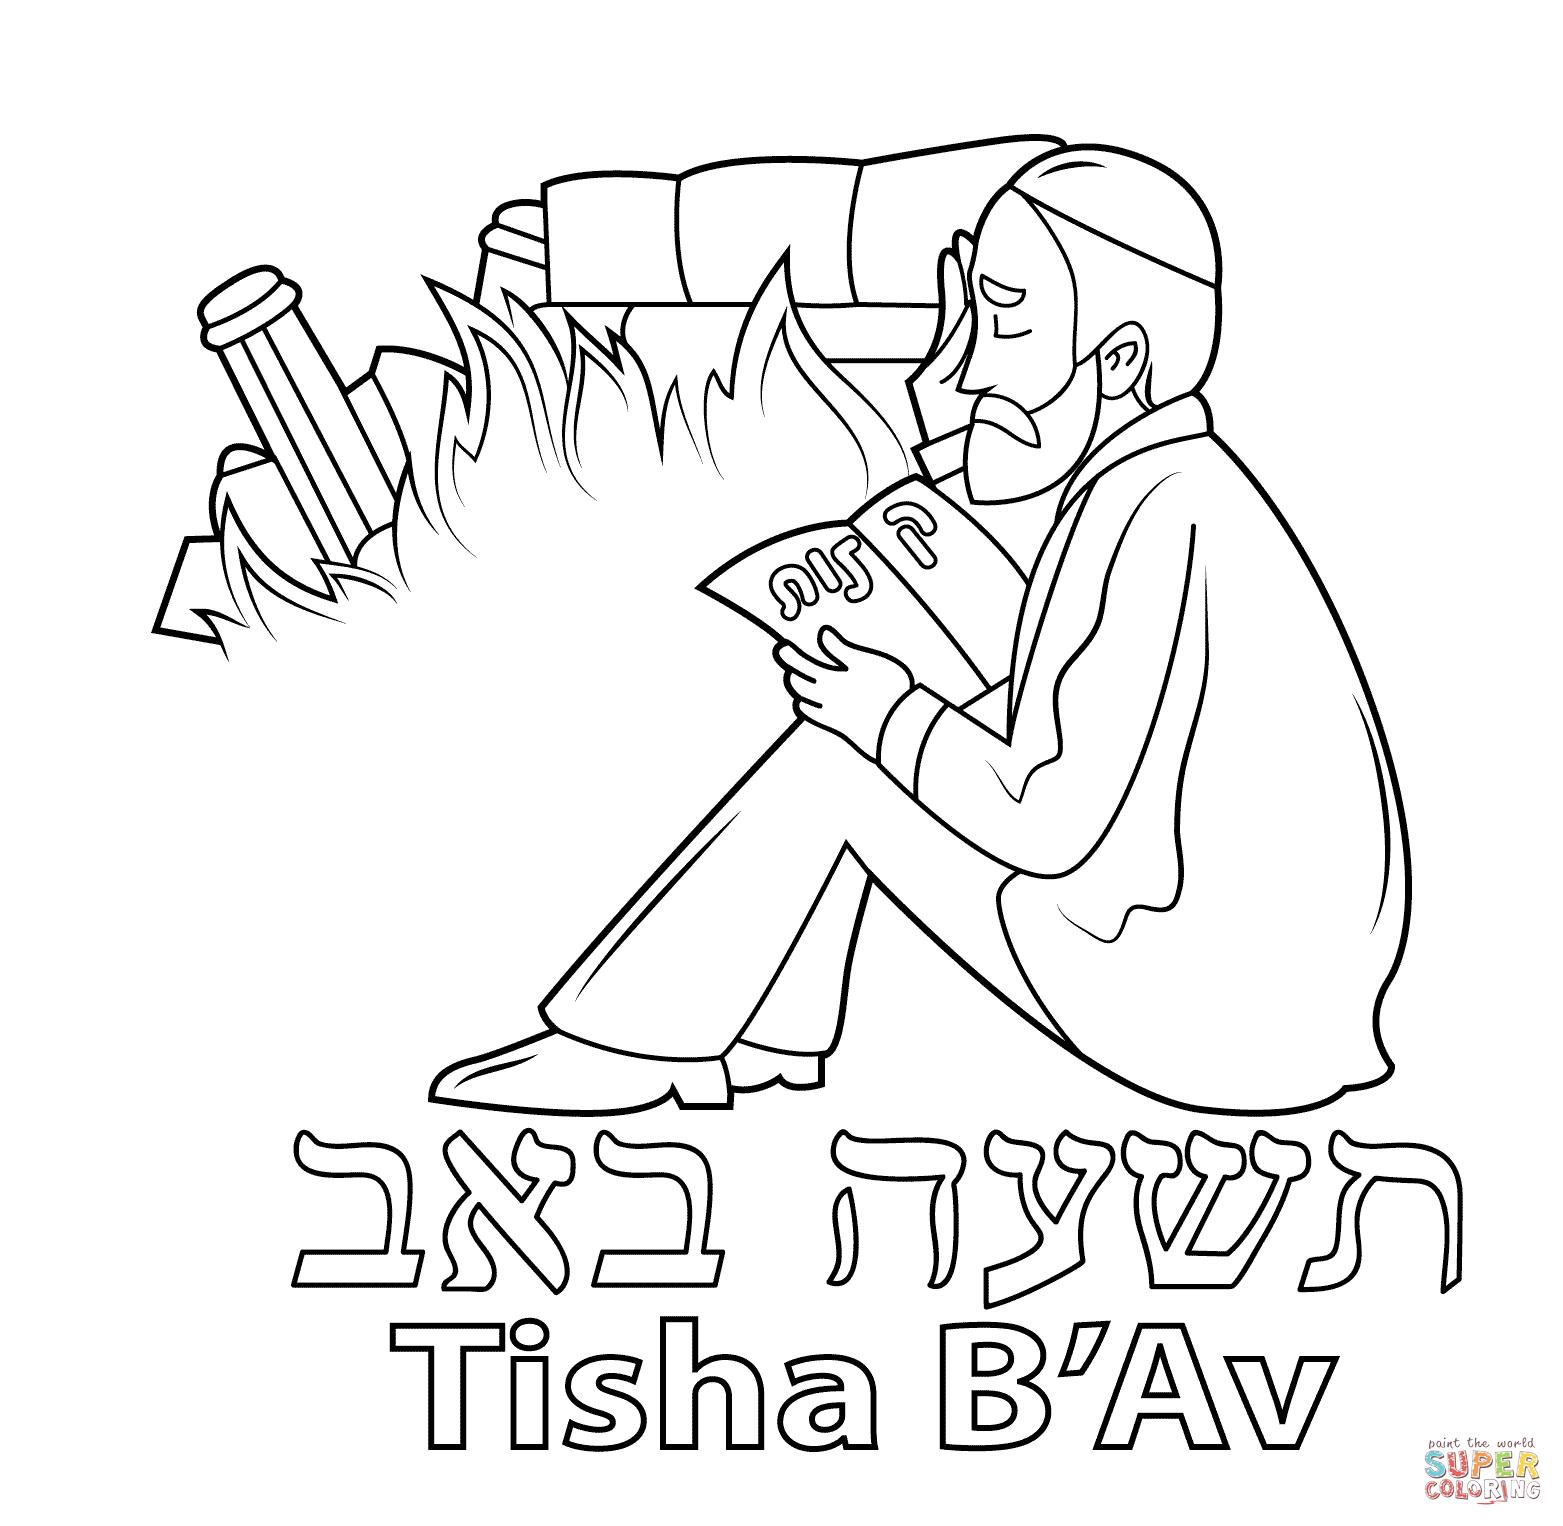 Tisha B Av Coloring Page